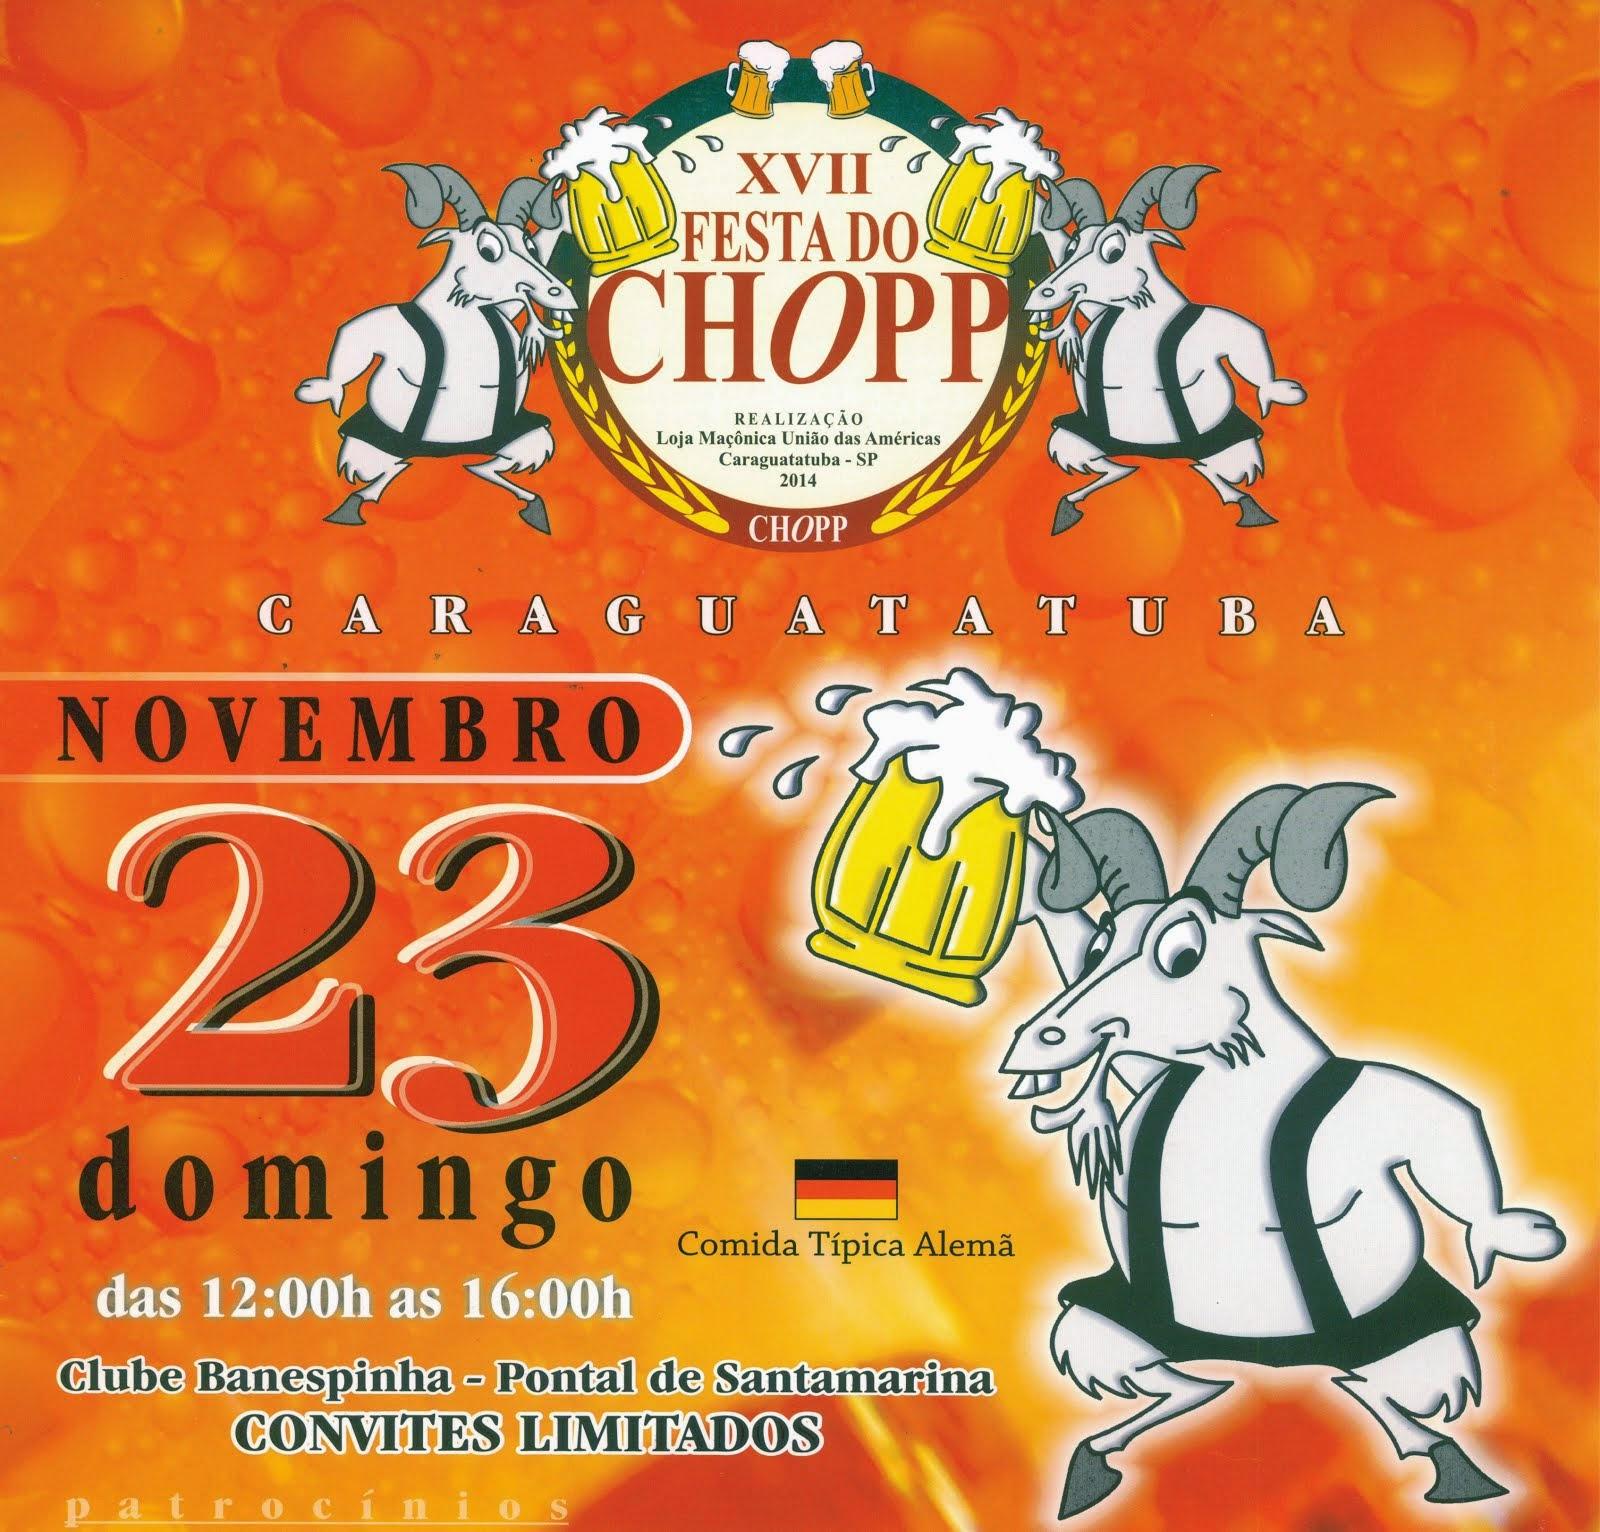 XVII FESTA DO CHOPP